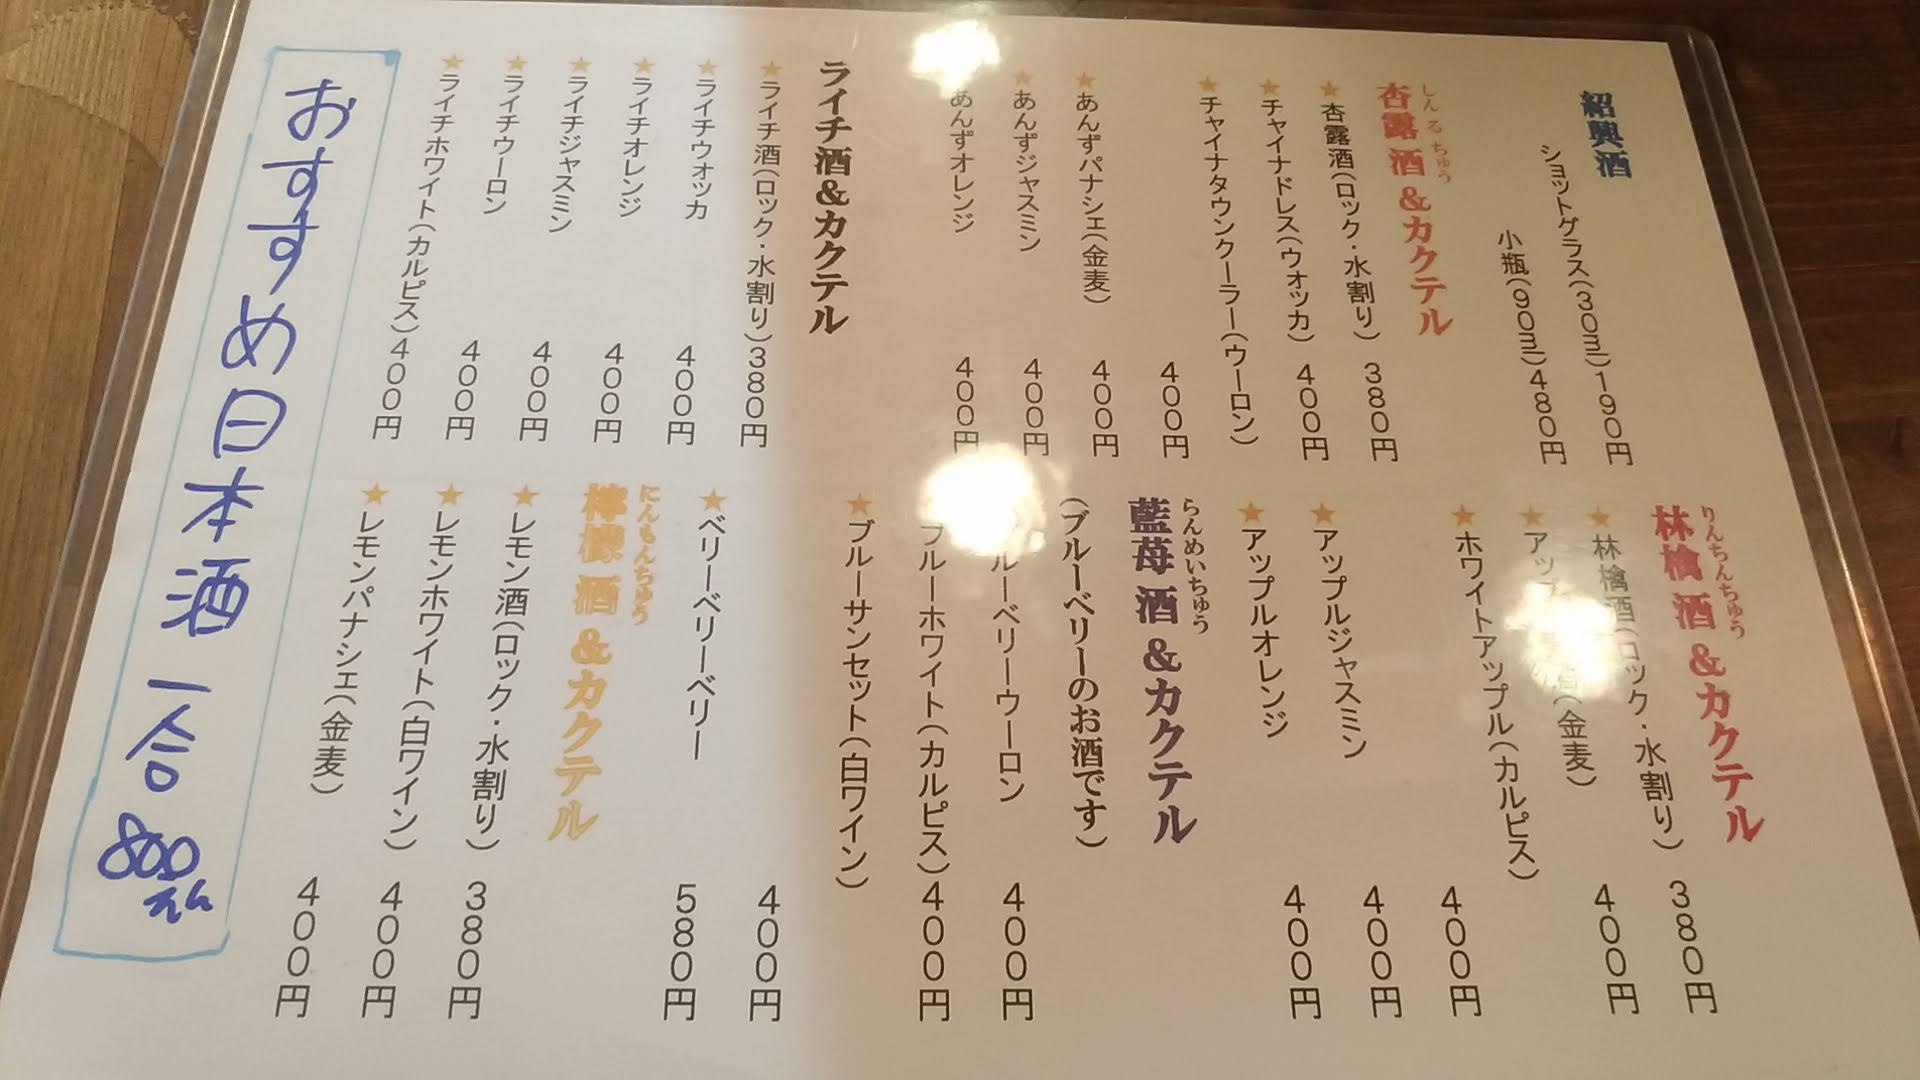 The drink menu of Shinka 2